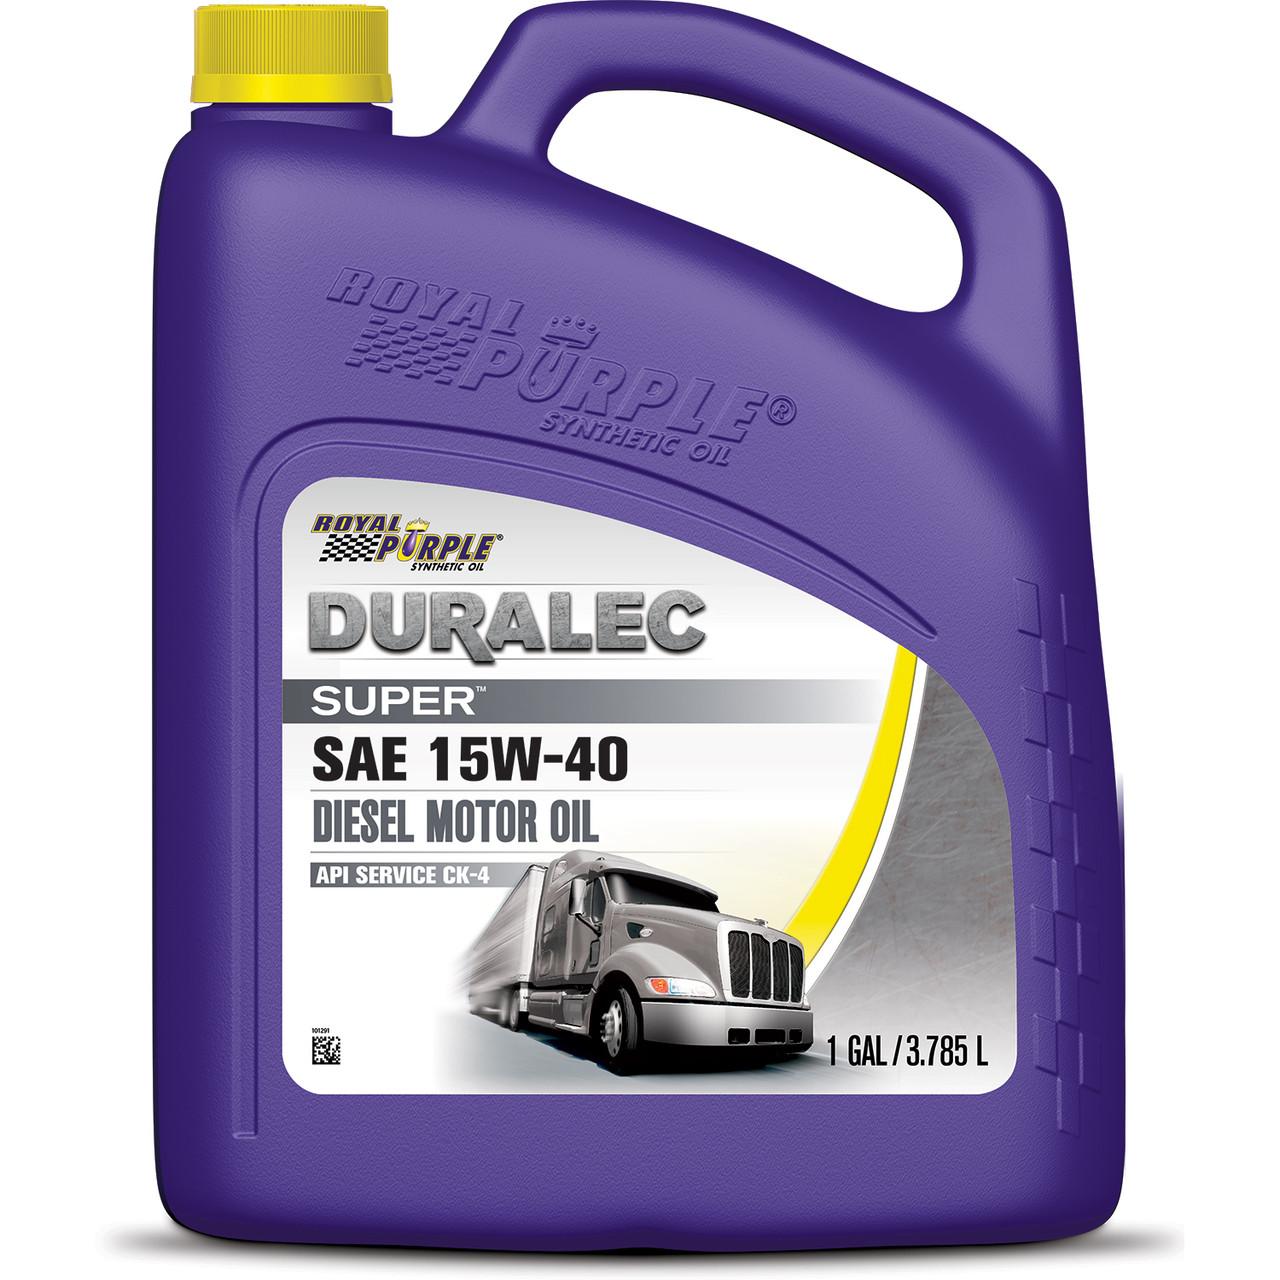 Duralec Super 15W-40